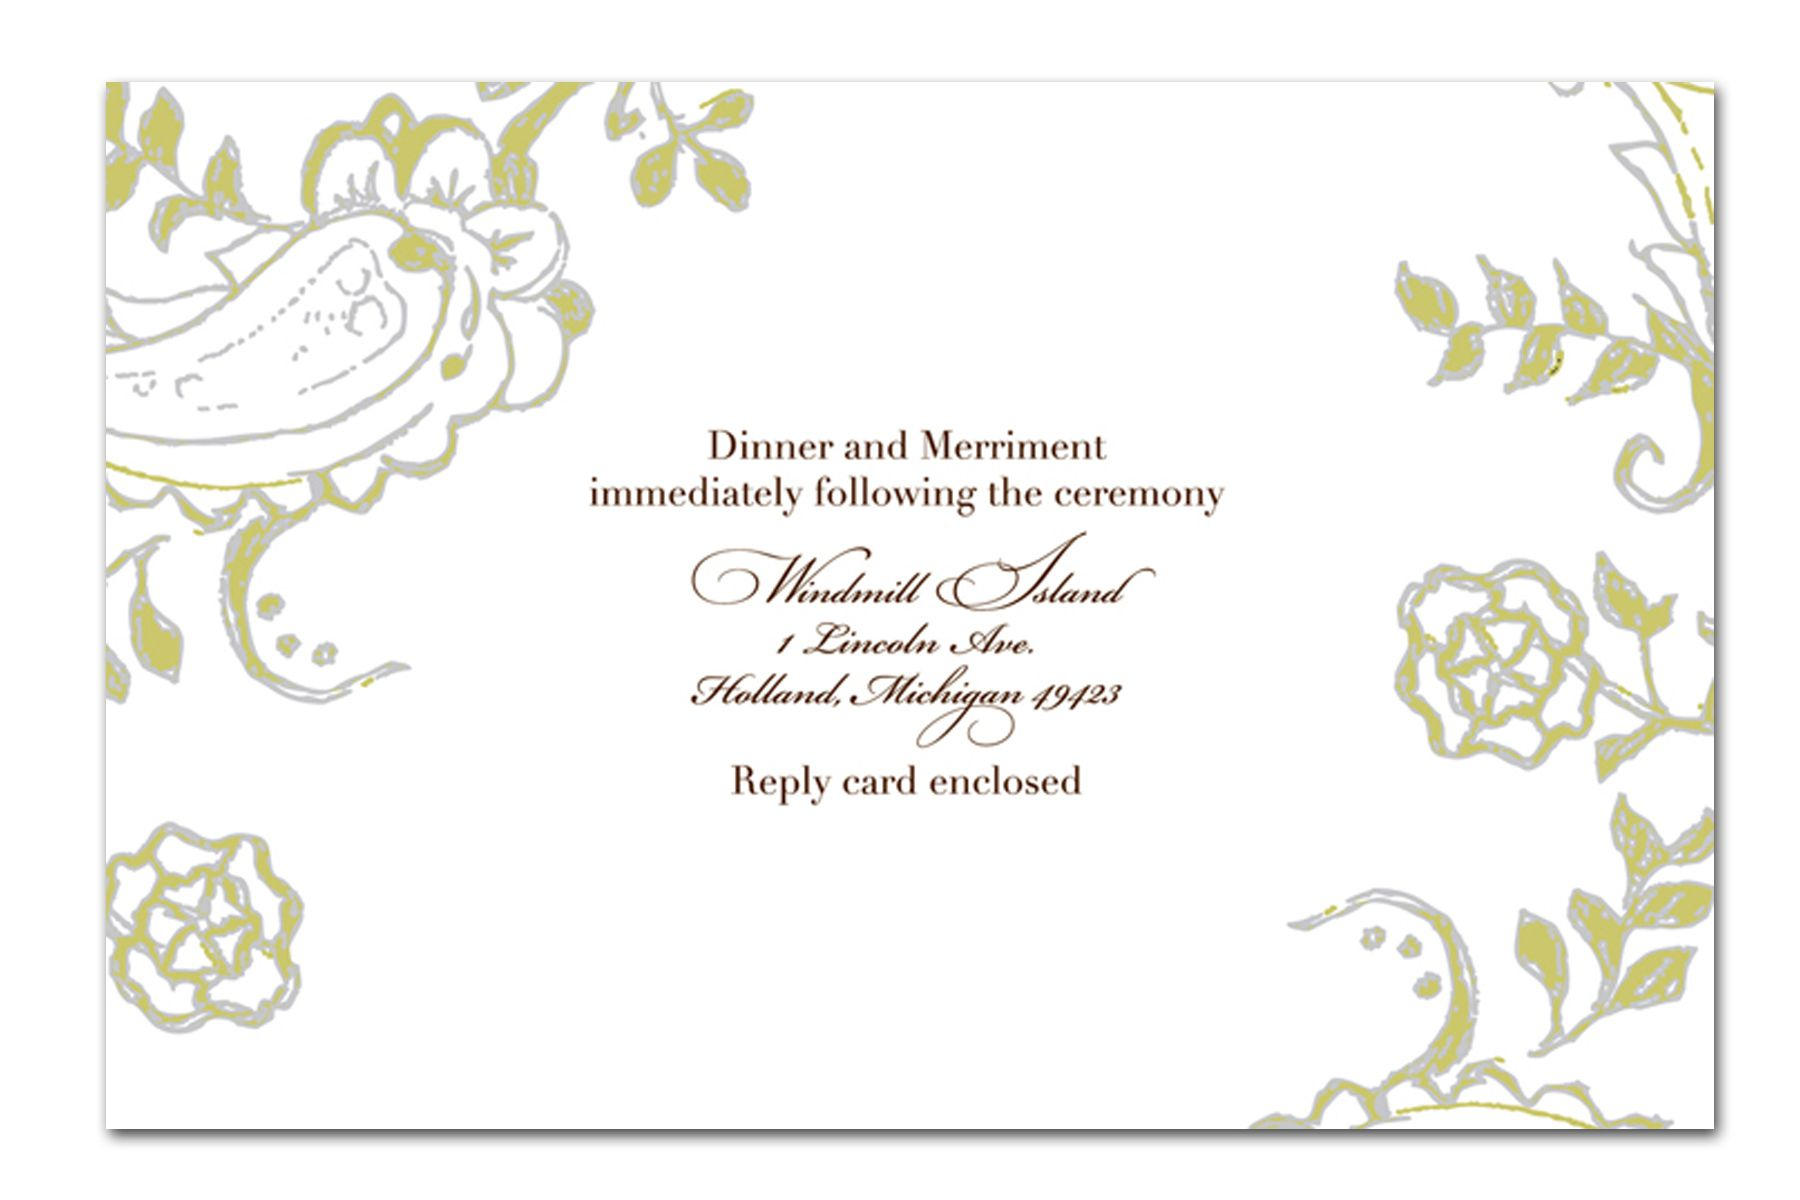 Best wedding invitations cards : wedding invitation card bible verse ...